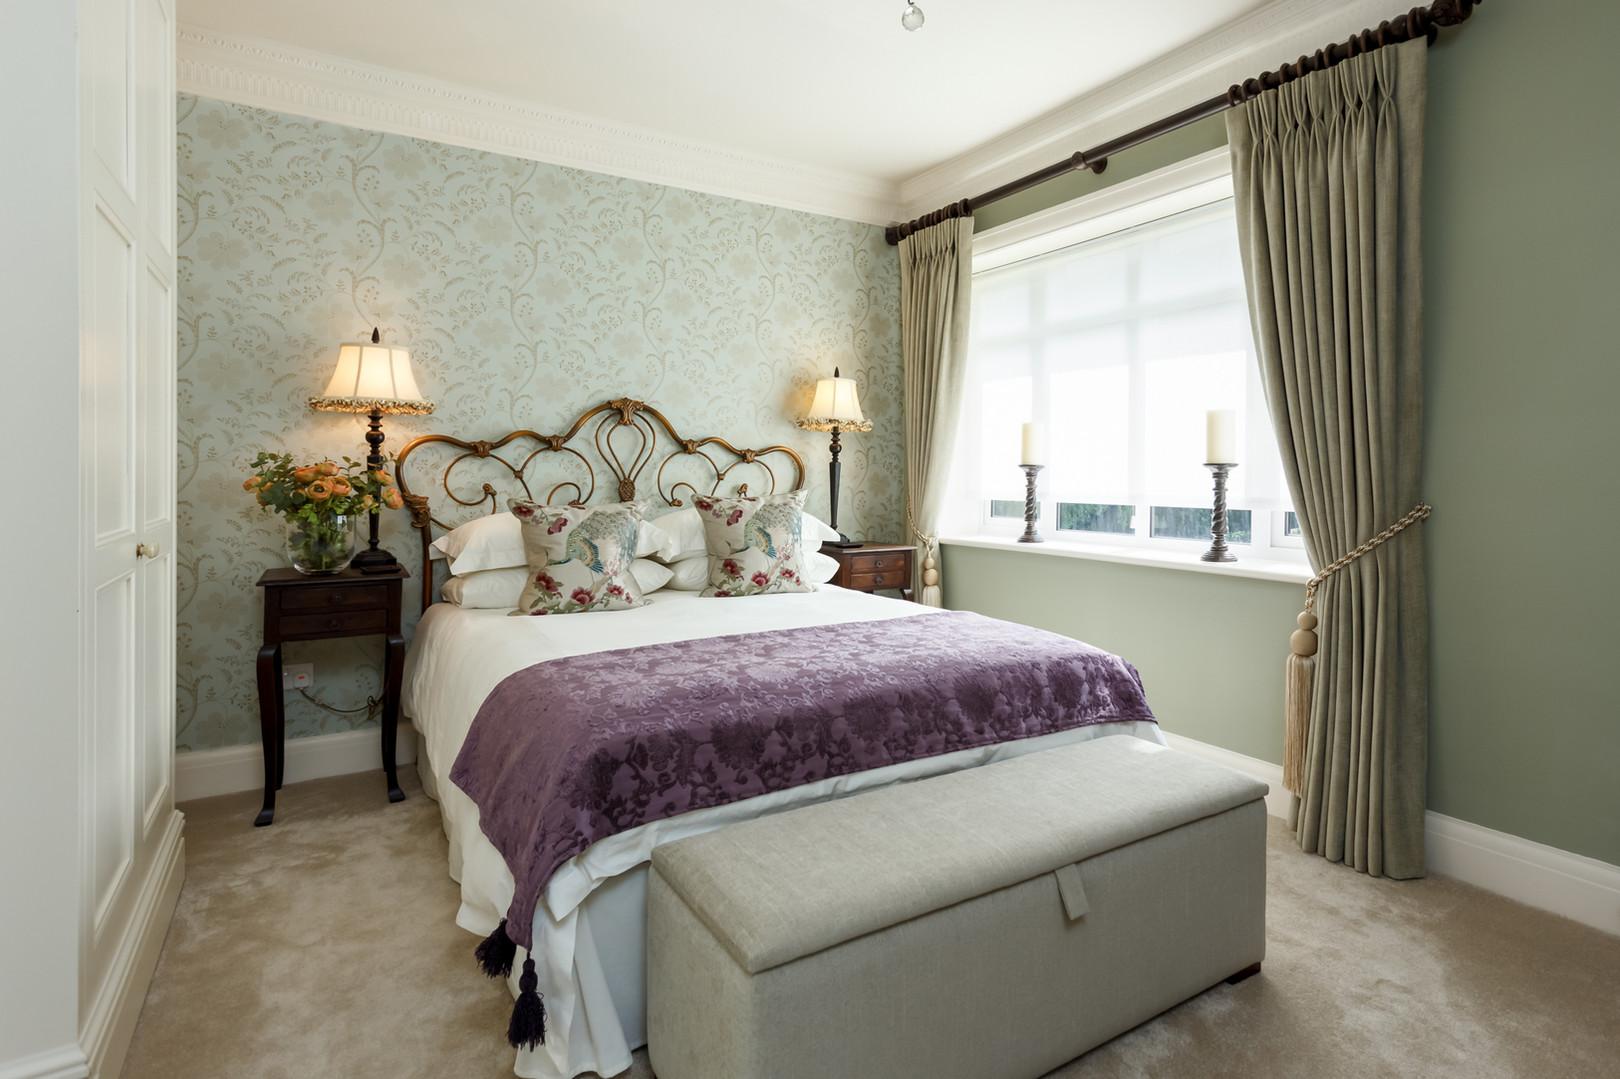 bedroom interior designer poole_web.jpg